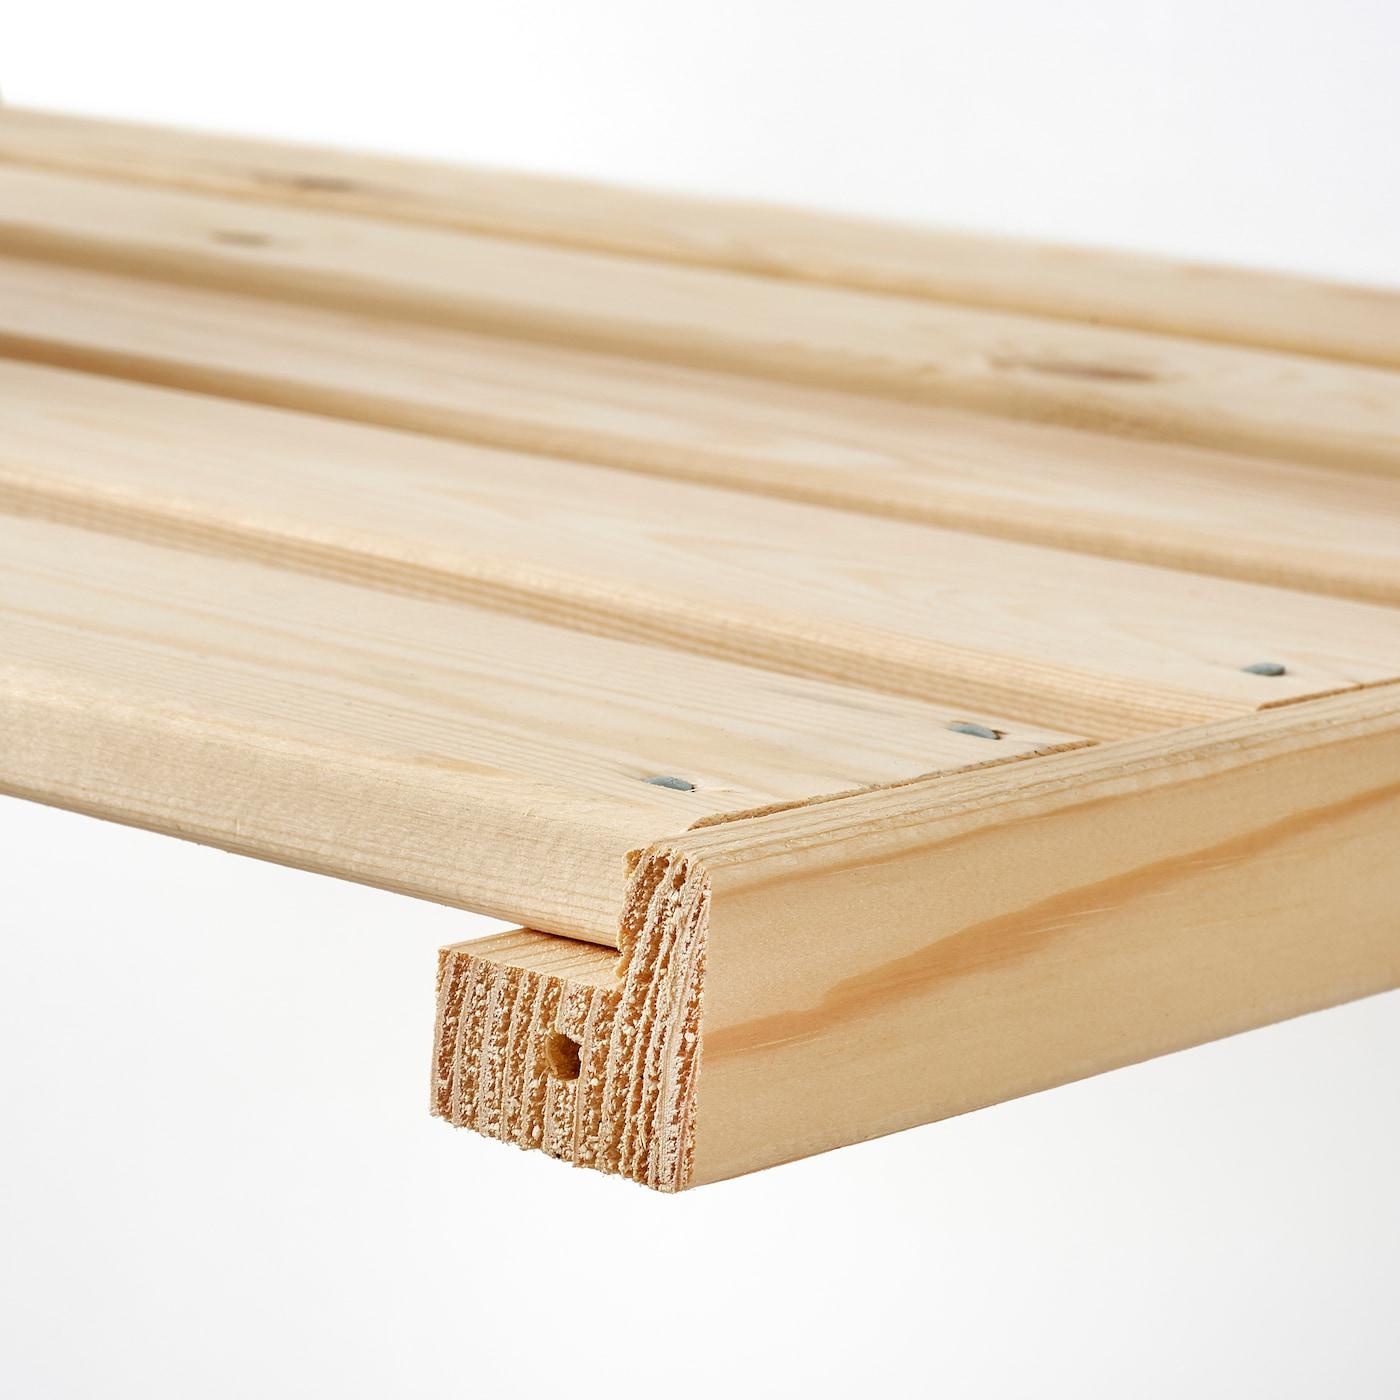 HEJNE Shelf, 77x47 cm 2 pack